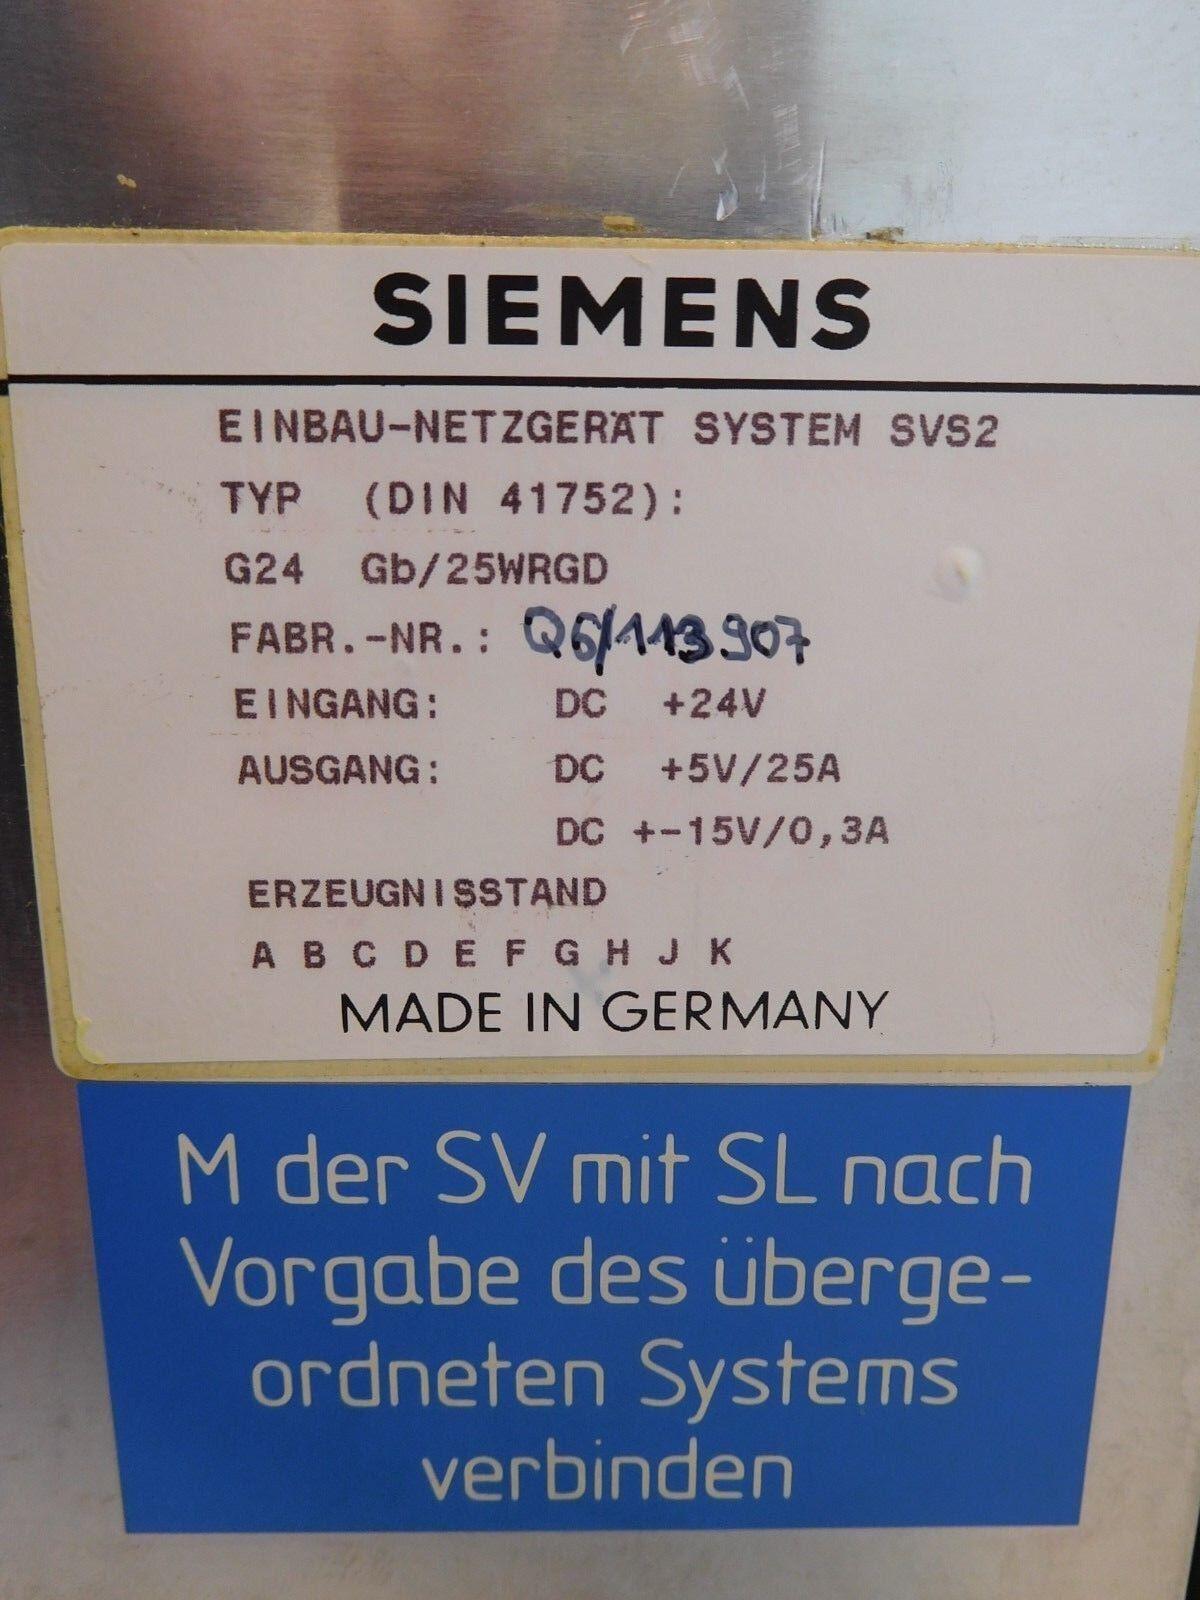 Siemens 6ev3054-0dc Installation-VLP système type: svs2 type: système g24 GO/25 wgrd a9a0bc